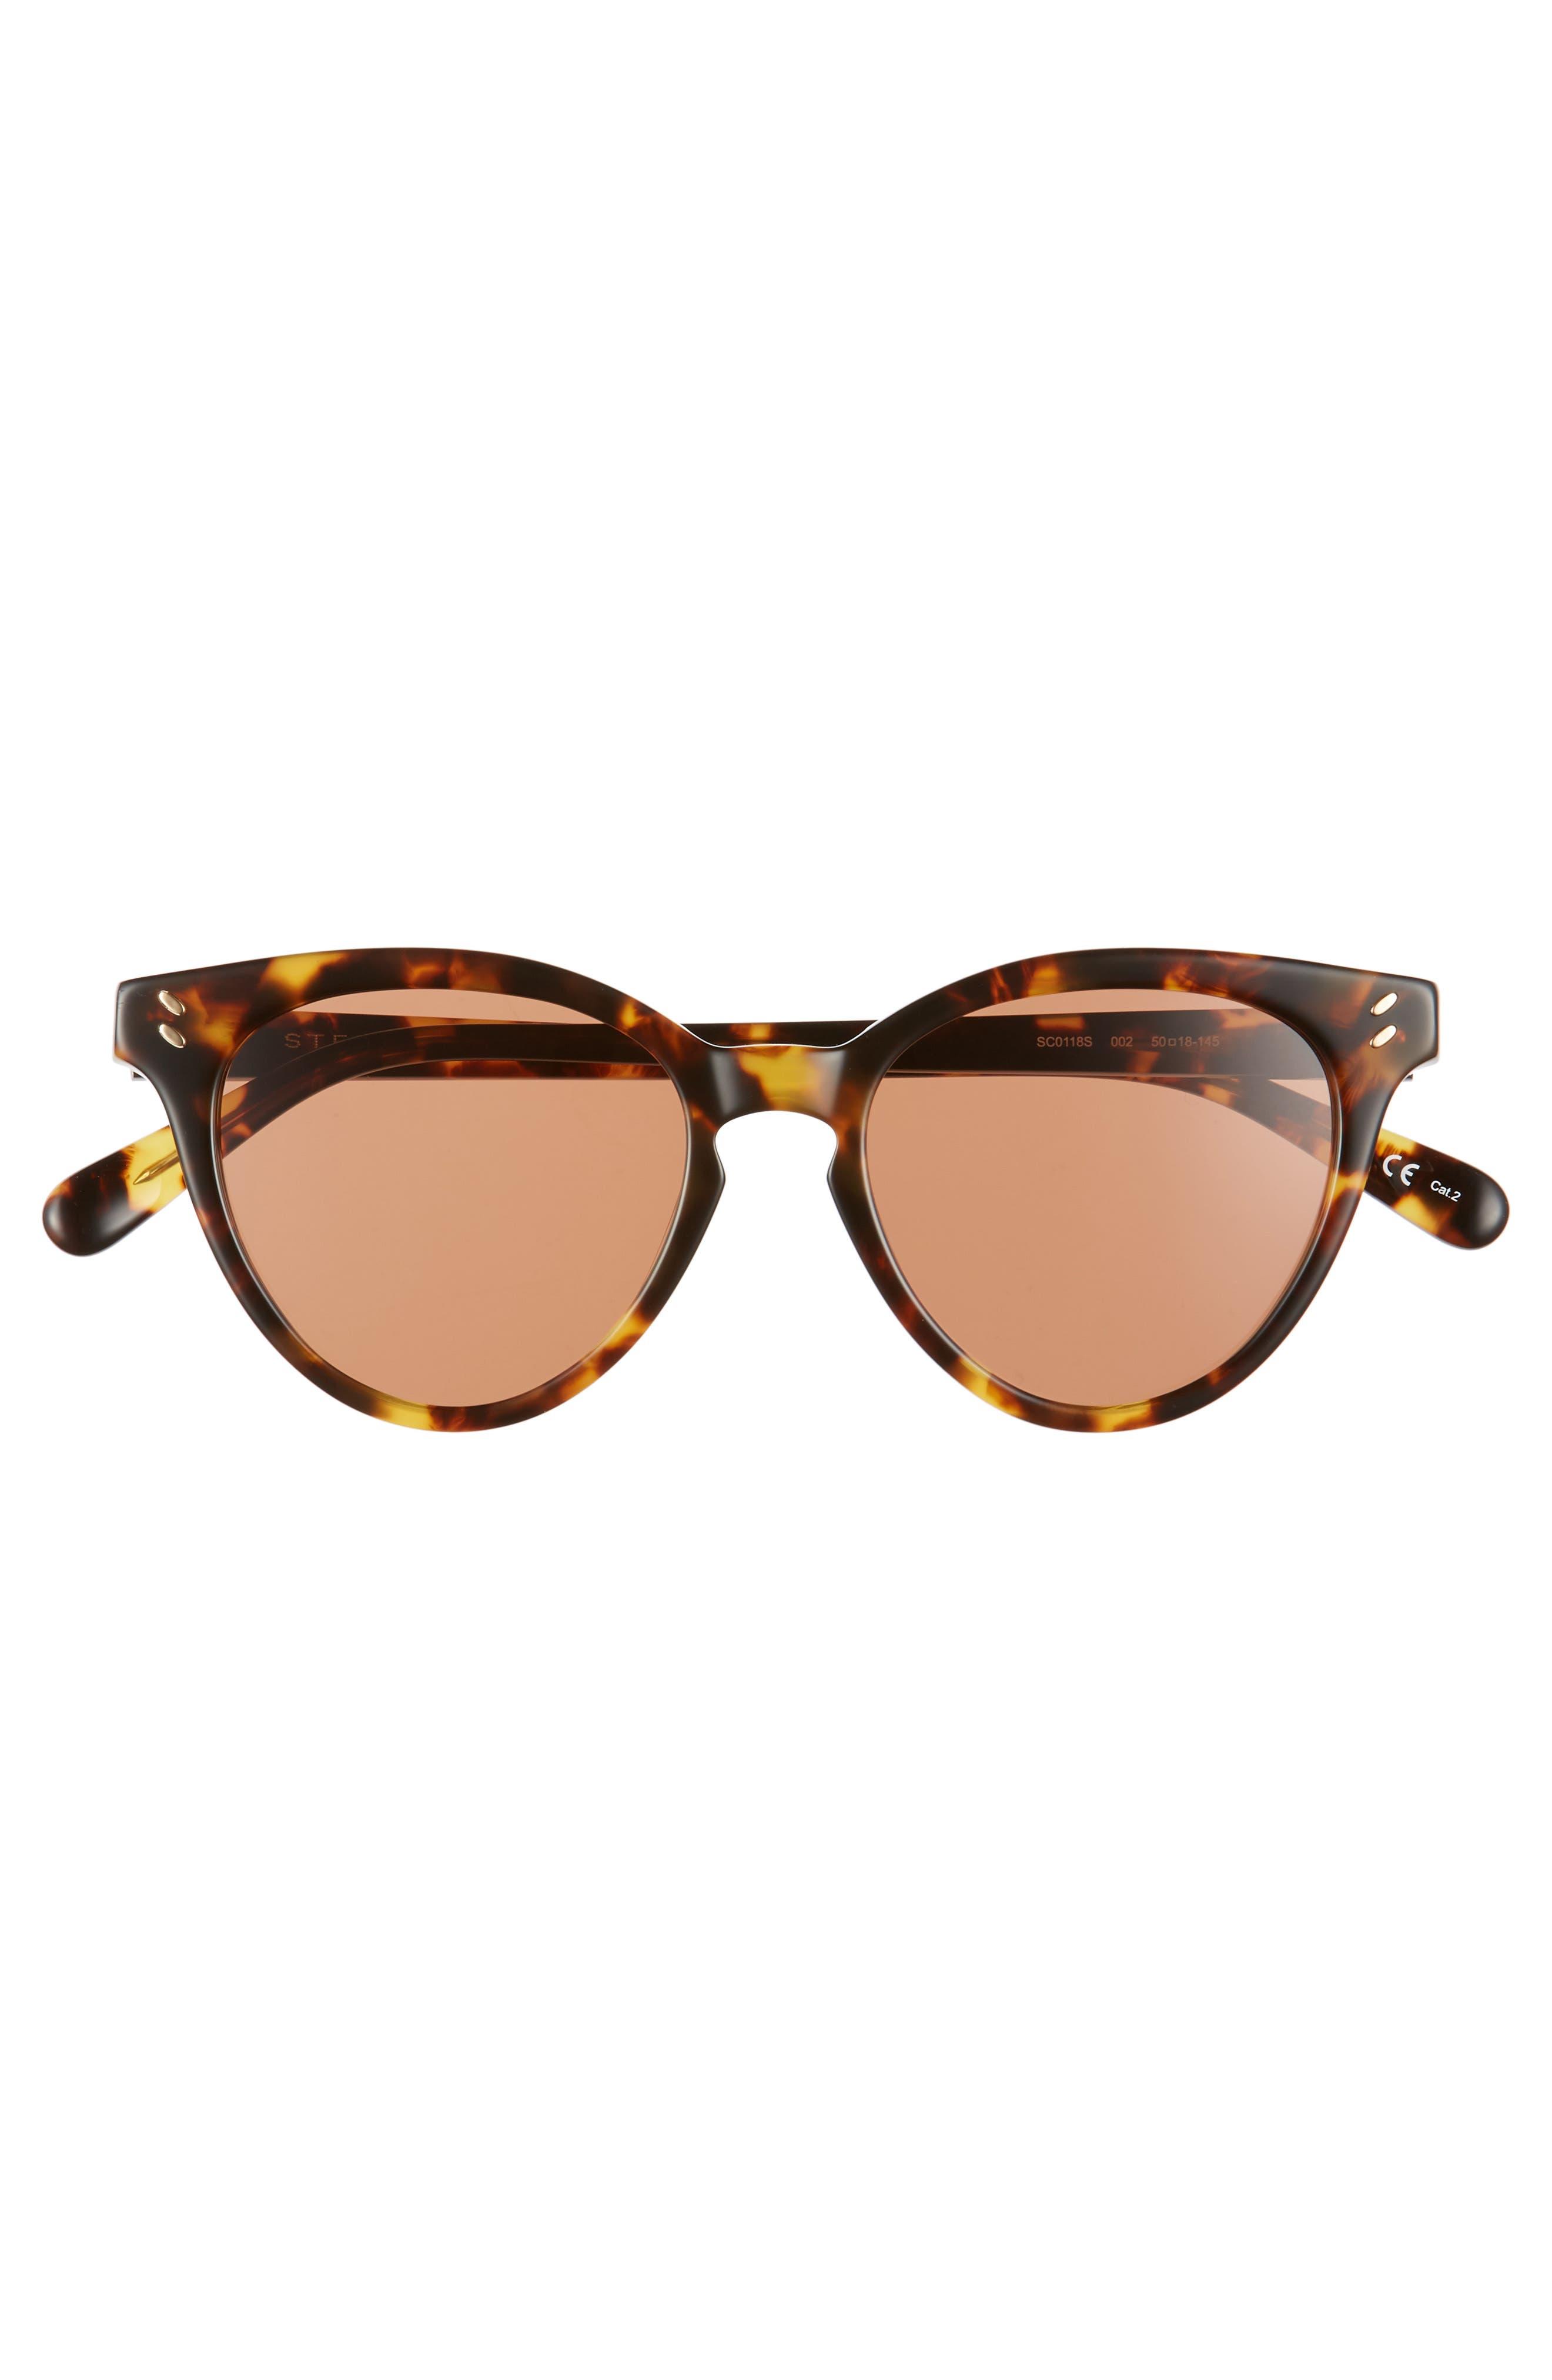 50mm Round Sunglasses,                             Alternate thumbnail 3, color,                             Medium Havana